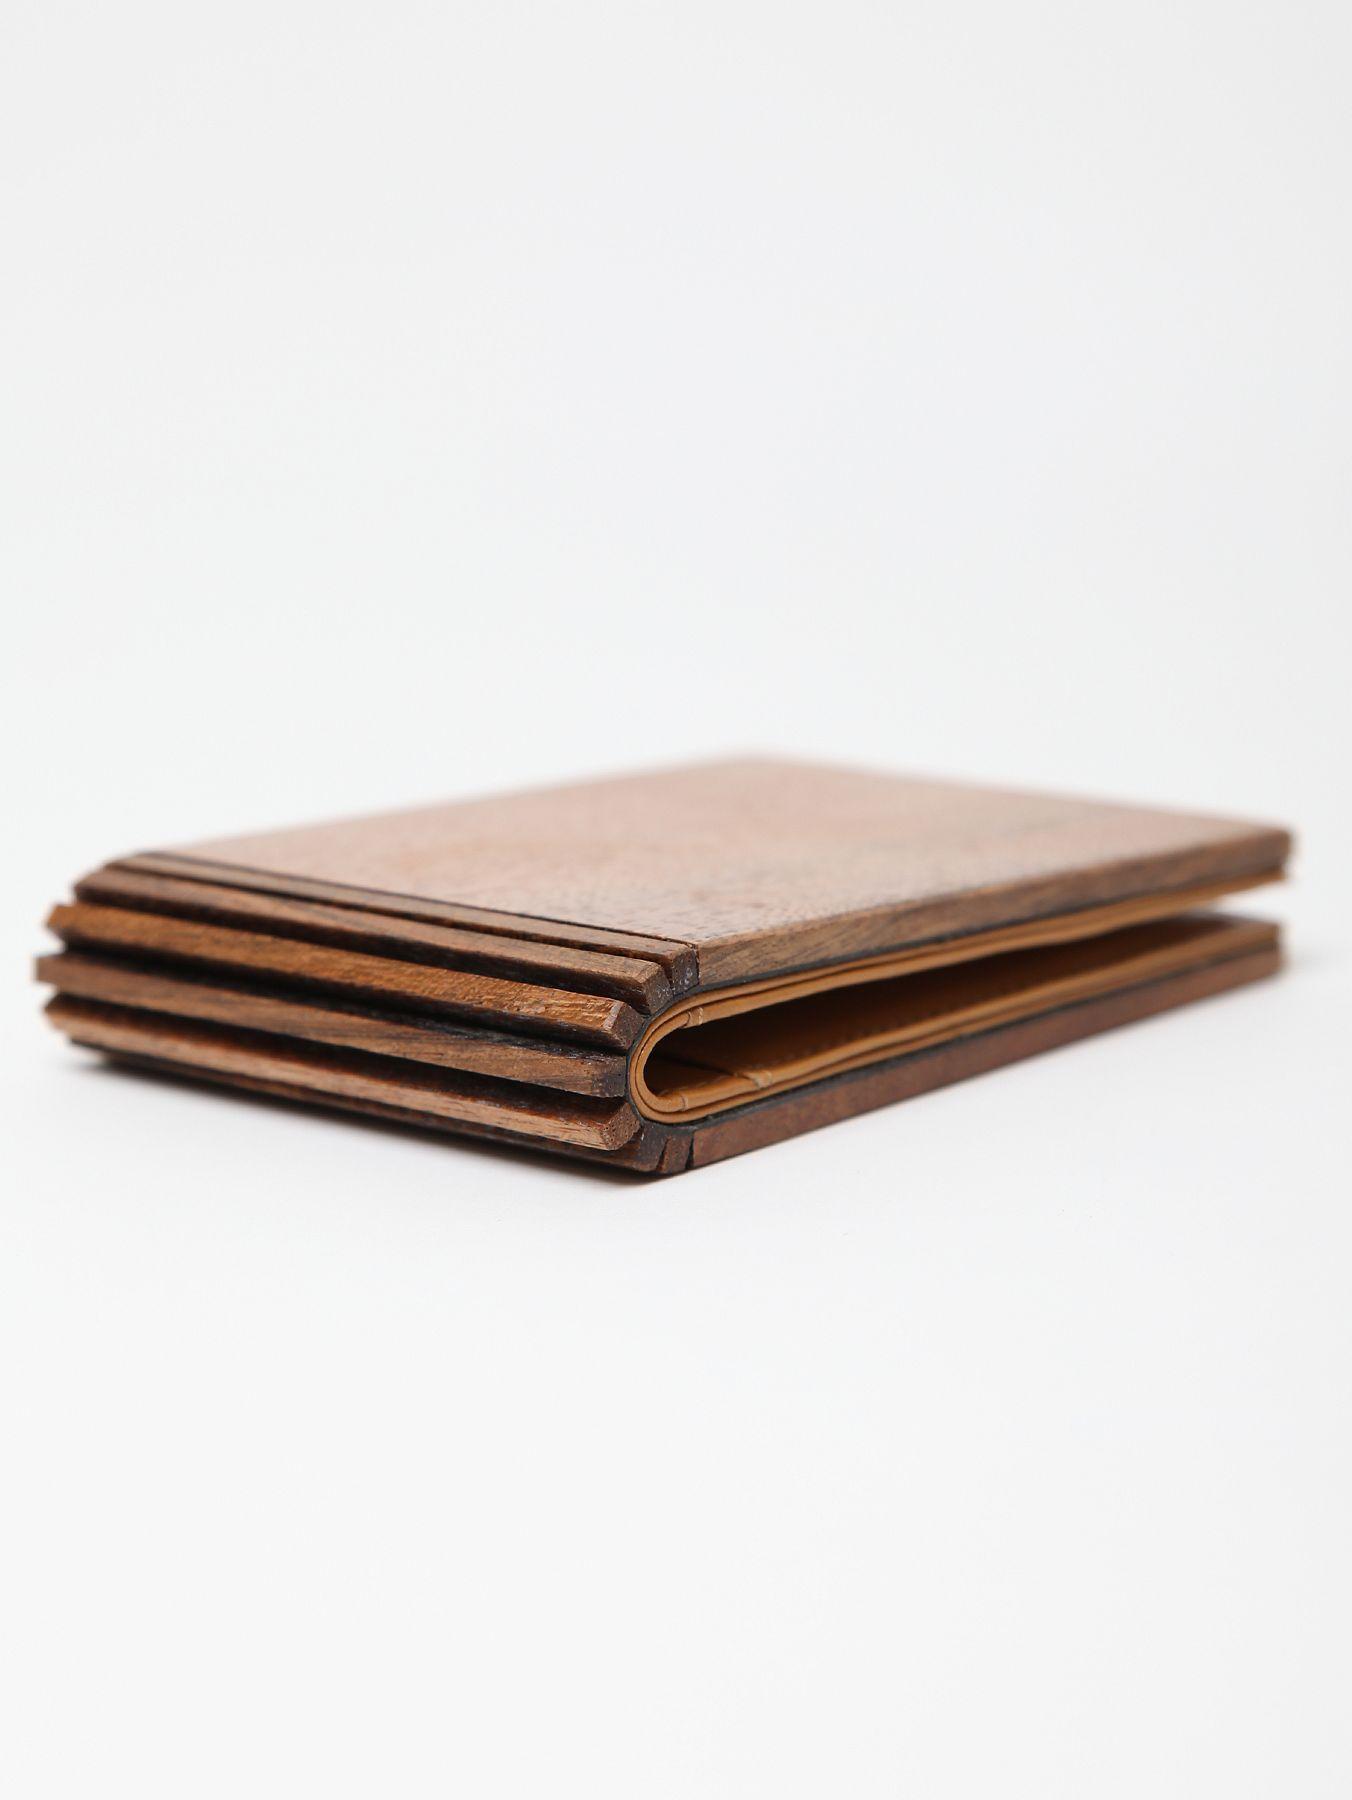 wood card holder wallet by maison martin margiela | ELYTS ...